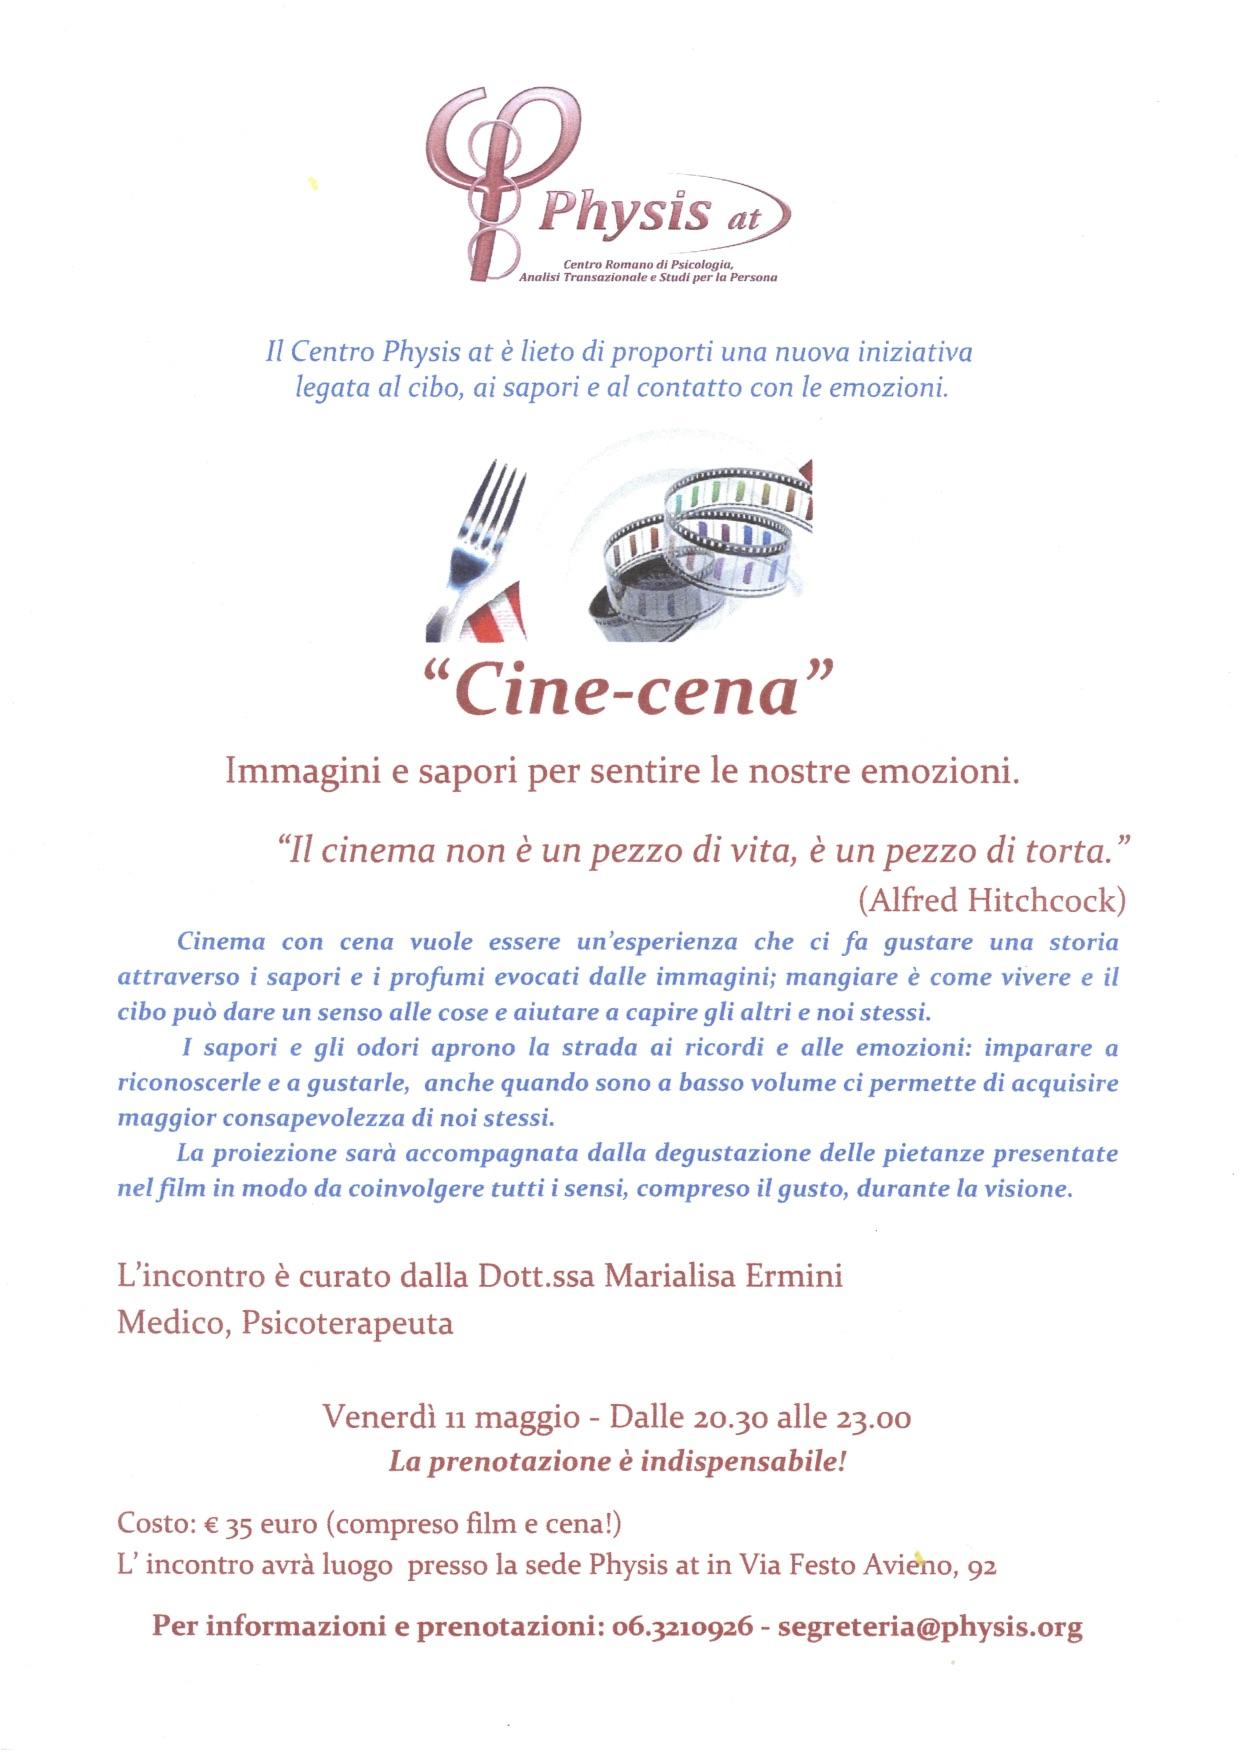 Cine-Cena